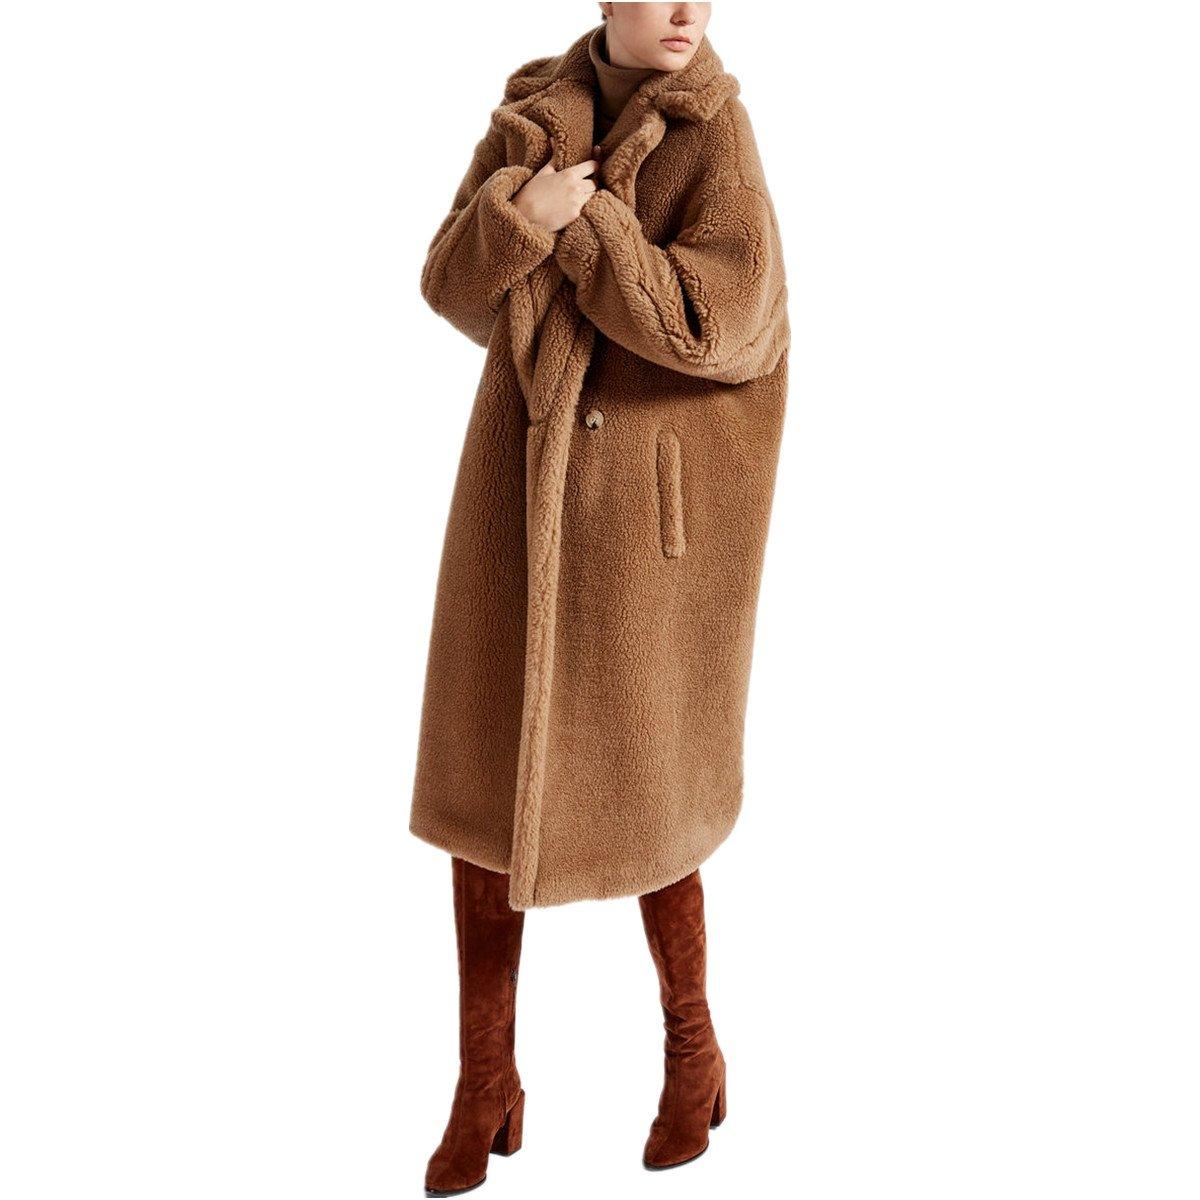 Carmonoudi Teddy Bear Icon Coat (Camel, Large)